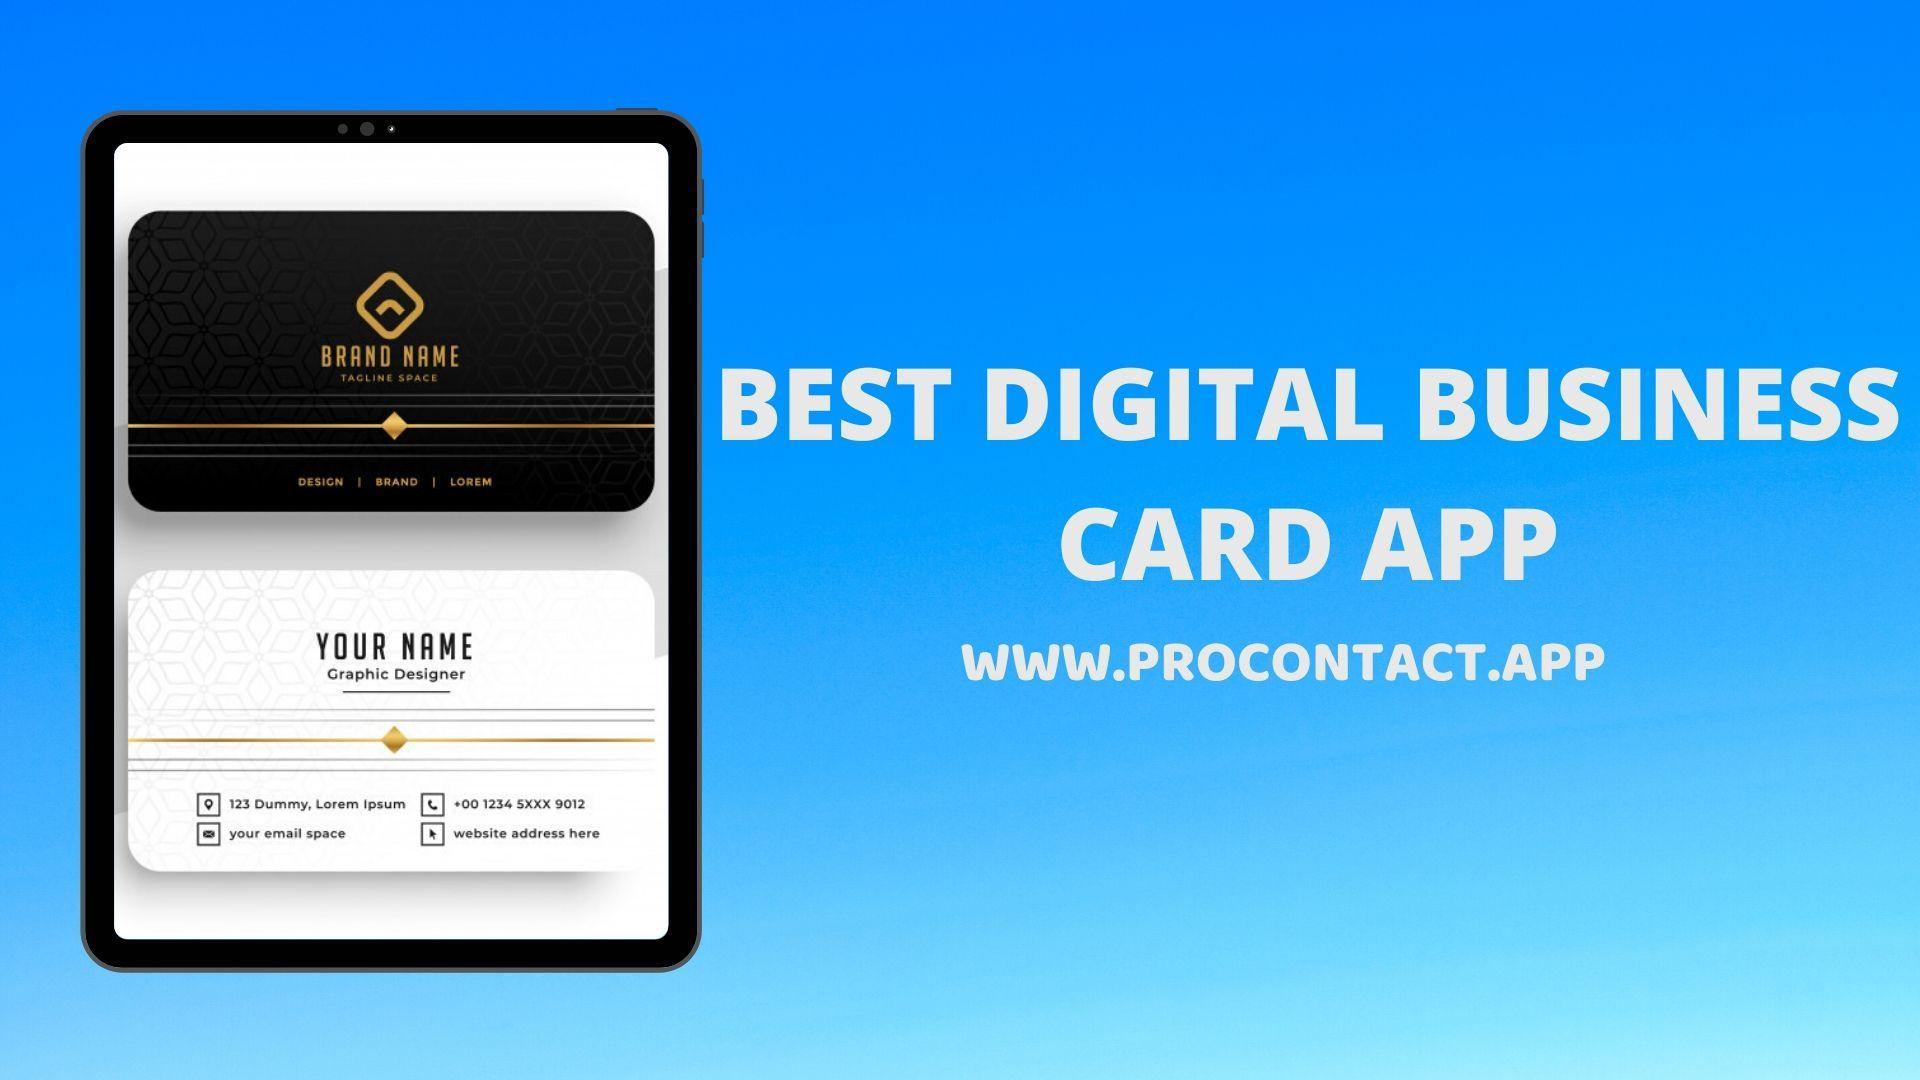 Procontact App Best App To Digitize Your Business Digital Business Card Business Card App Digital Business